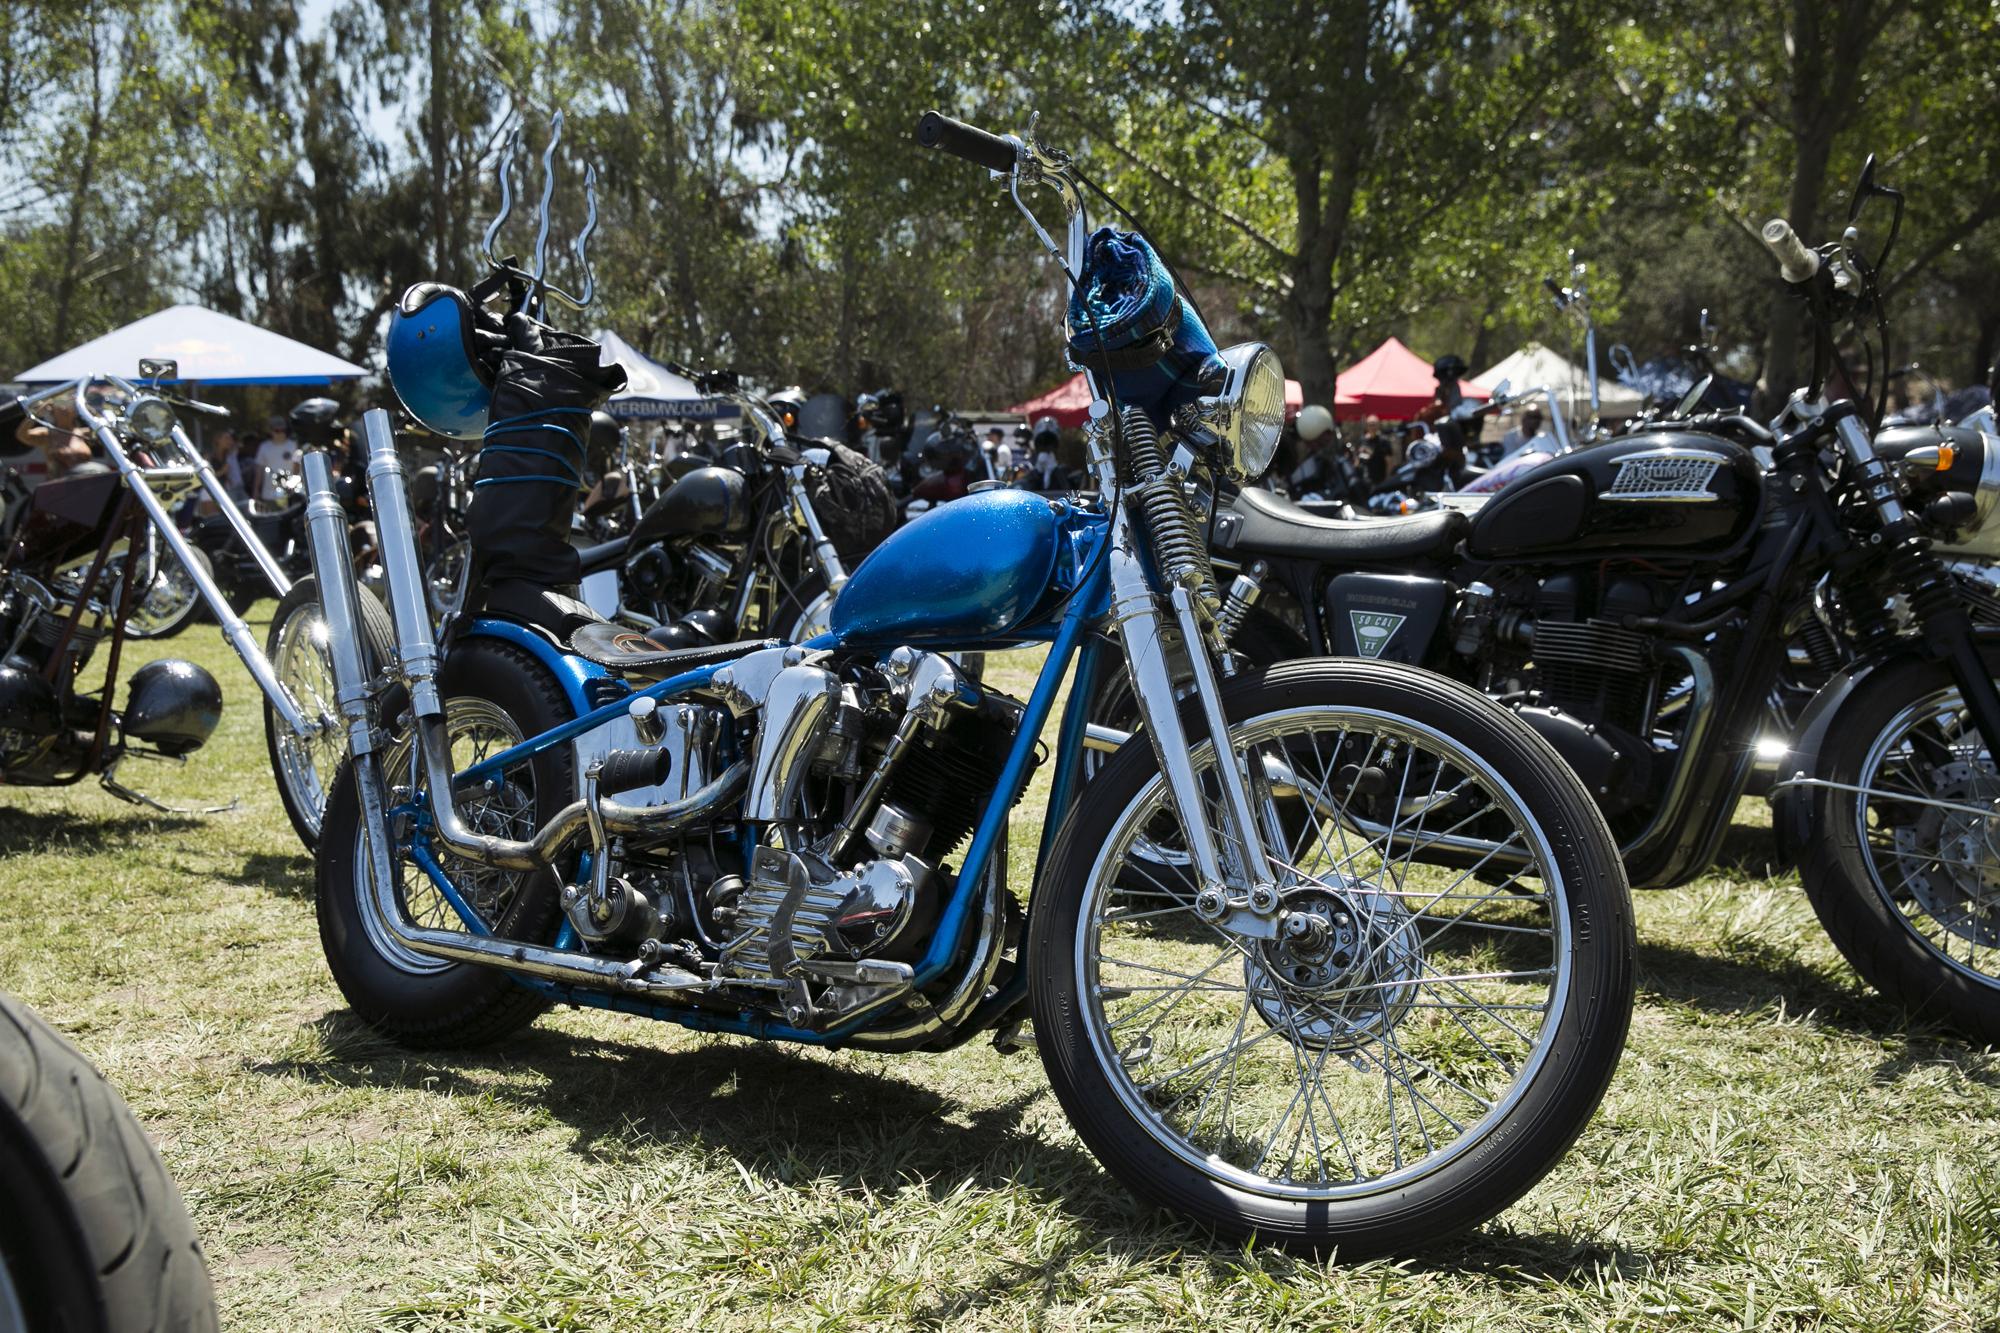 Born Free 8 Motorcycle Show-114.jpg